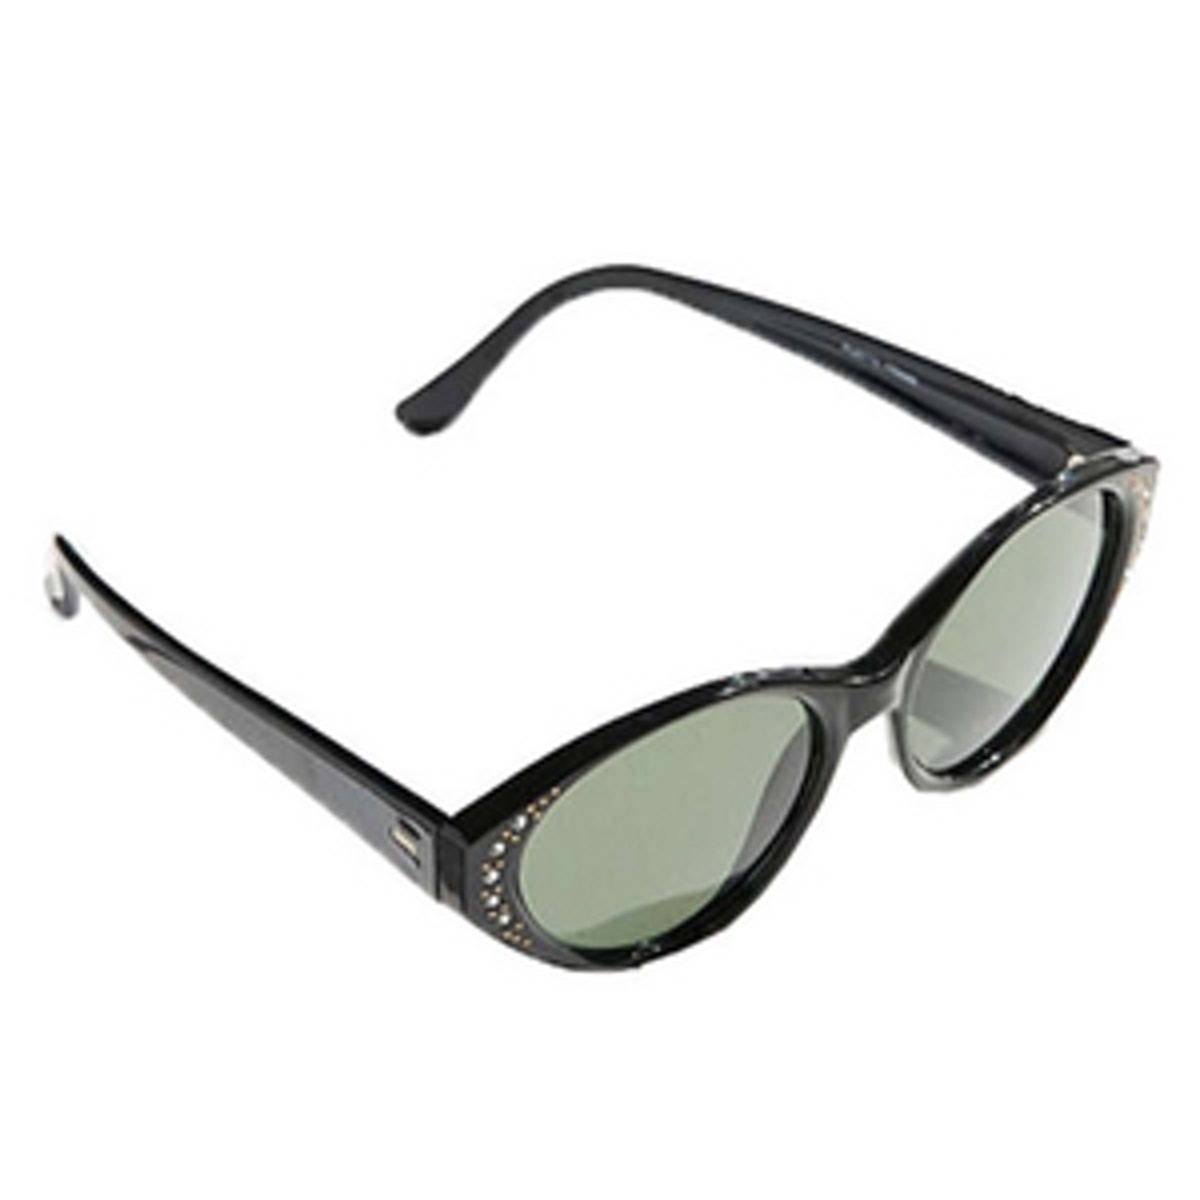 Vintage Rhinestone Cat-Eye Sunglasses